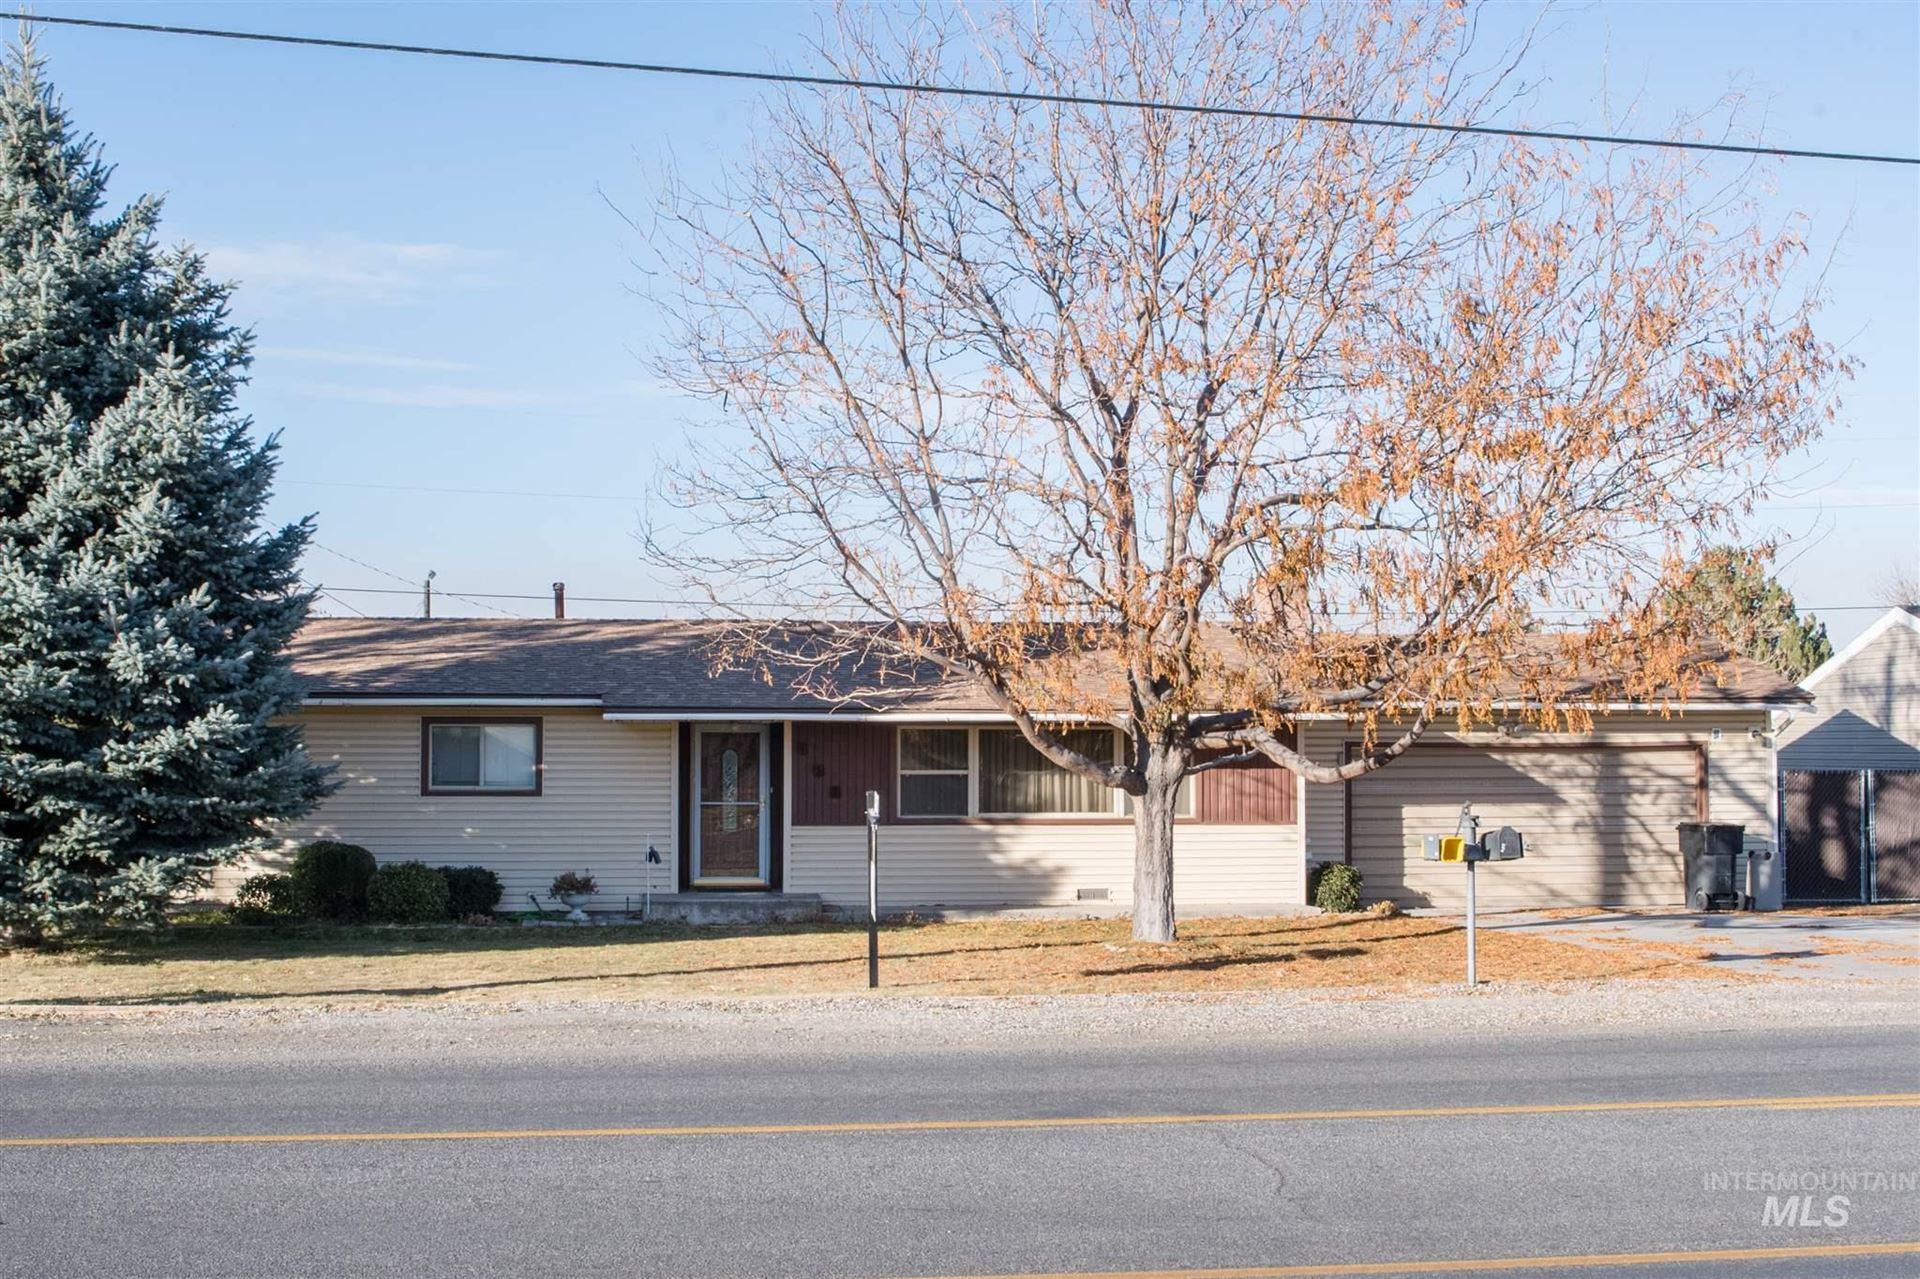 608 Sawtooth Ave, Buhl, ID 83316 - MLS#: 98785046